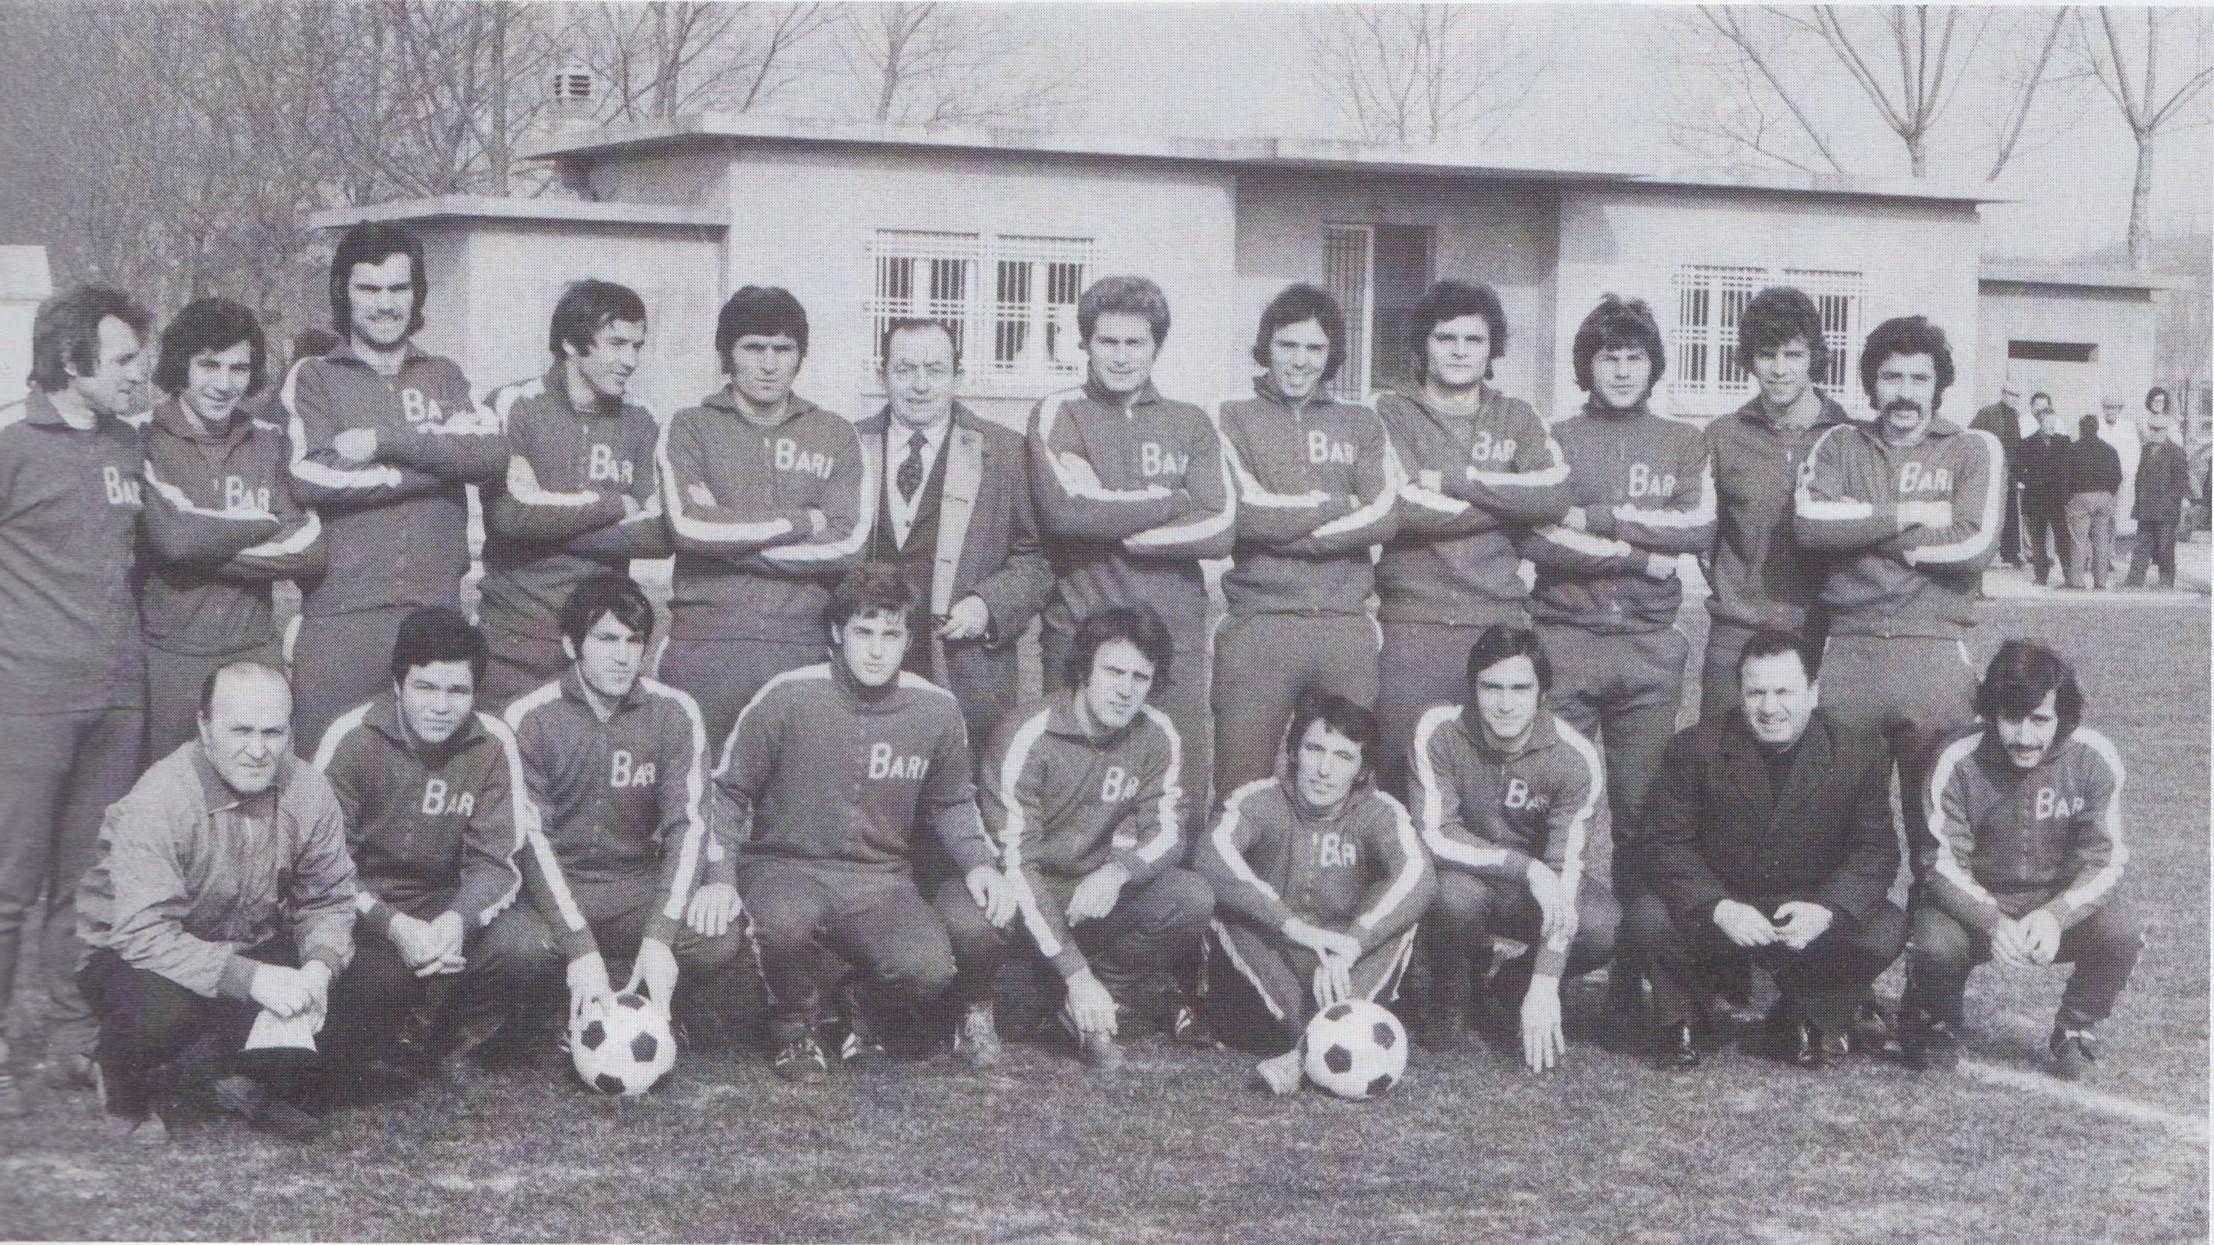 Associazione Sportiva Bari 1972-1973 - Wikipedia bbf6c9b07435